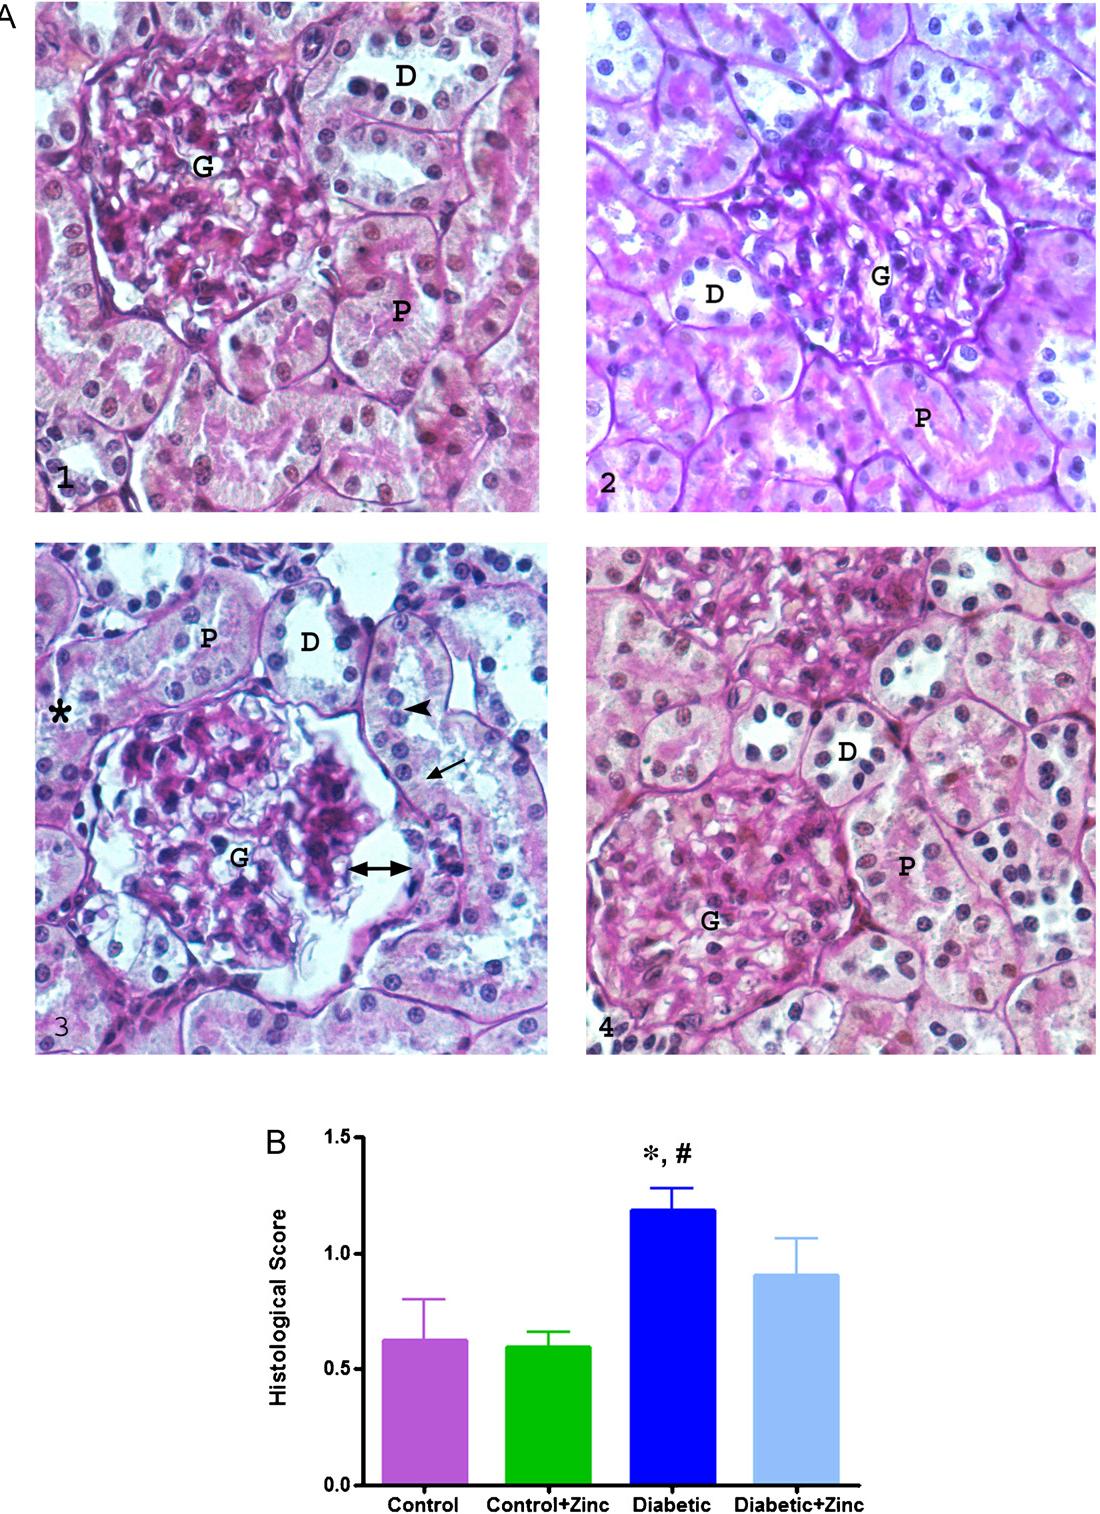 Alterations In Kidney Tissue Following Zinc Supplementation To Stz